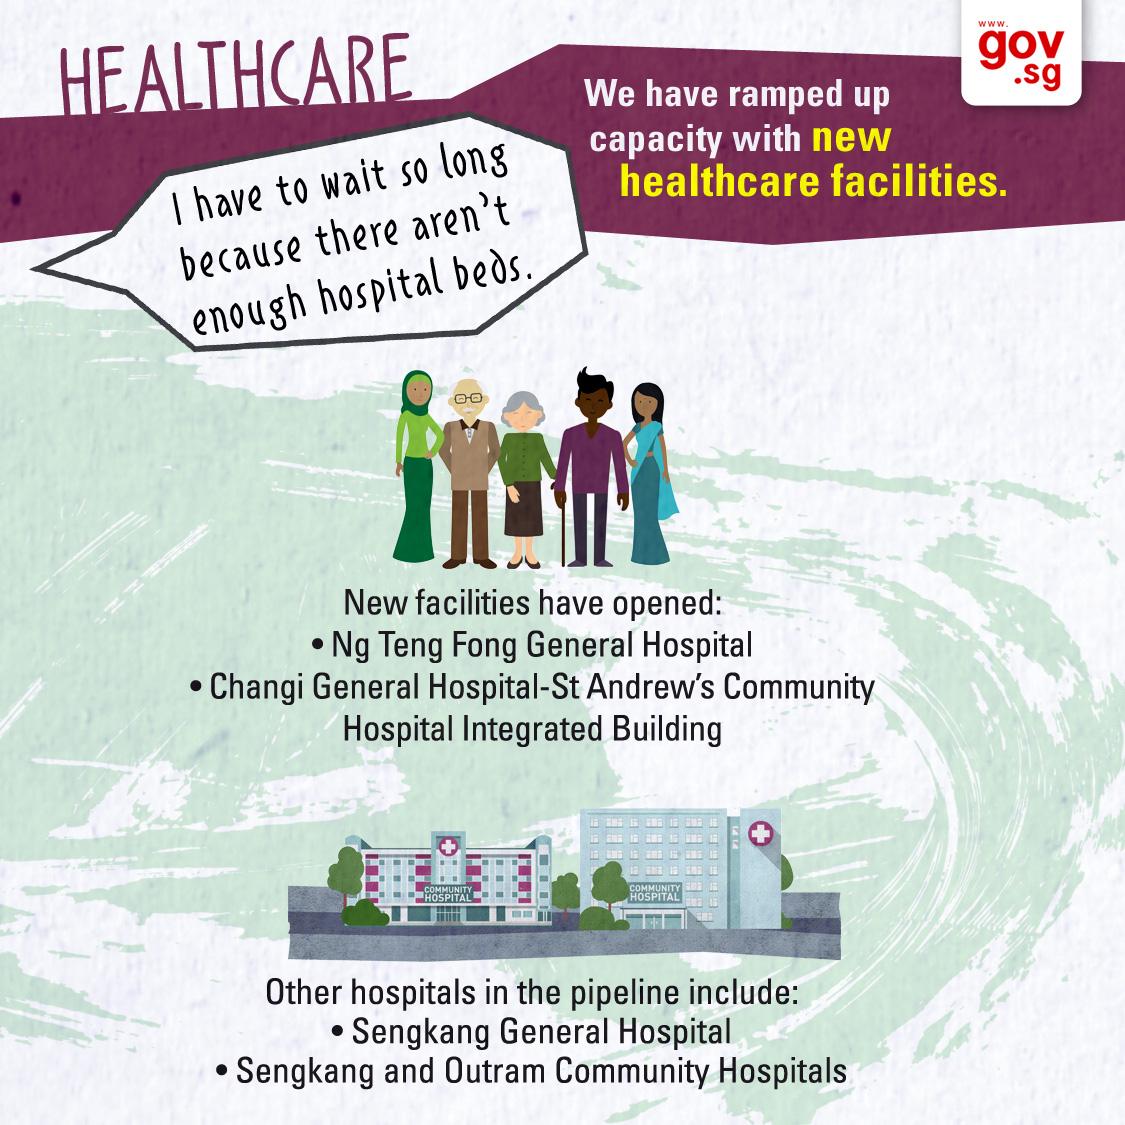 HEALTHCARE05